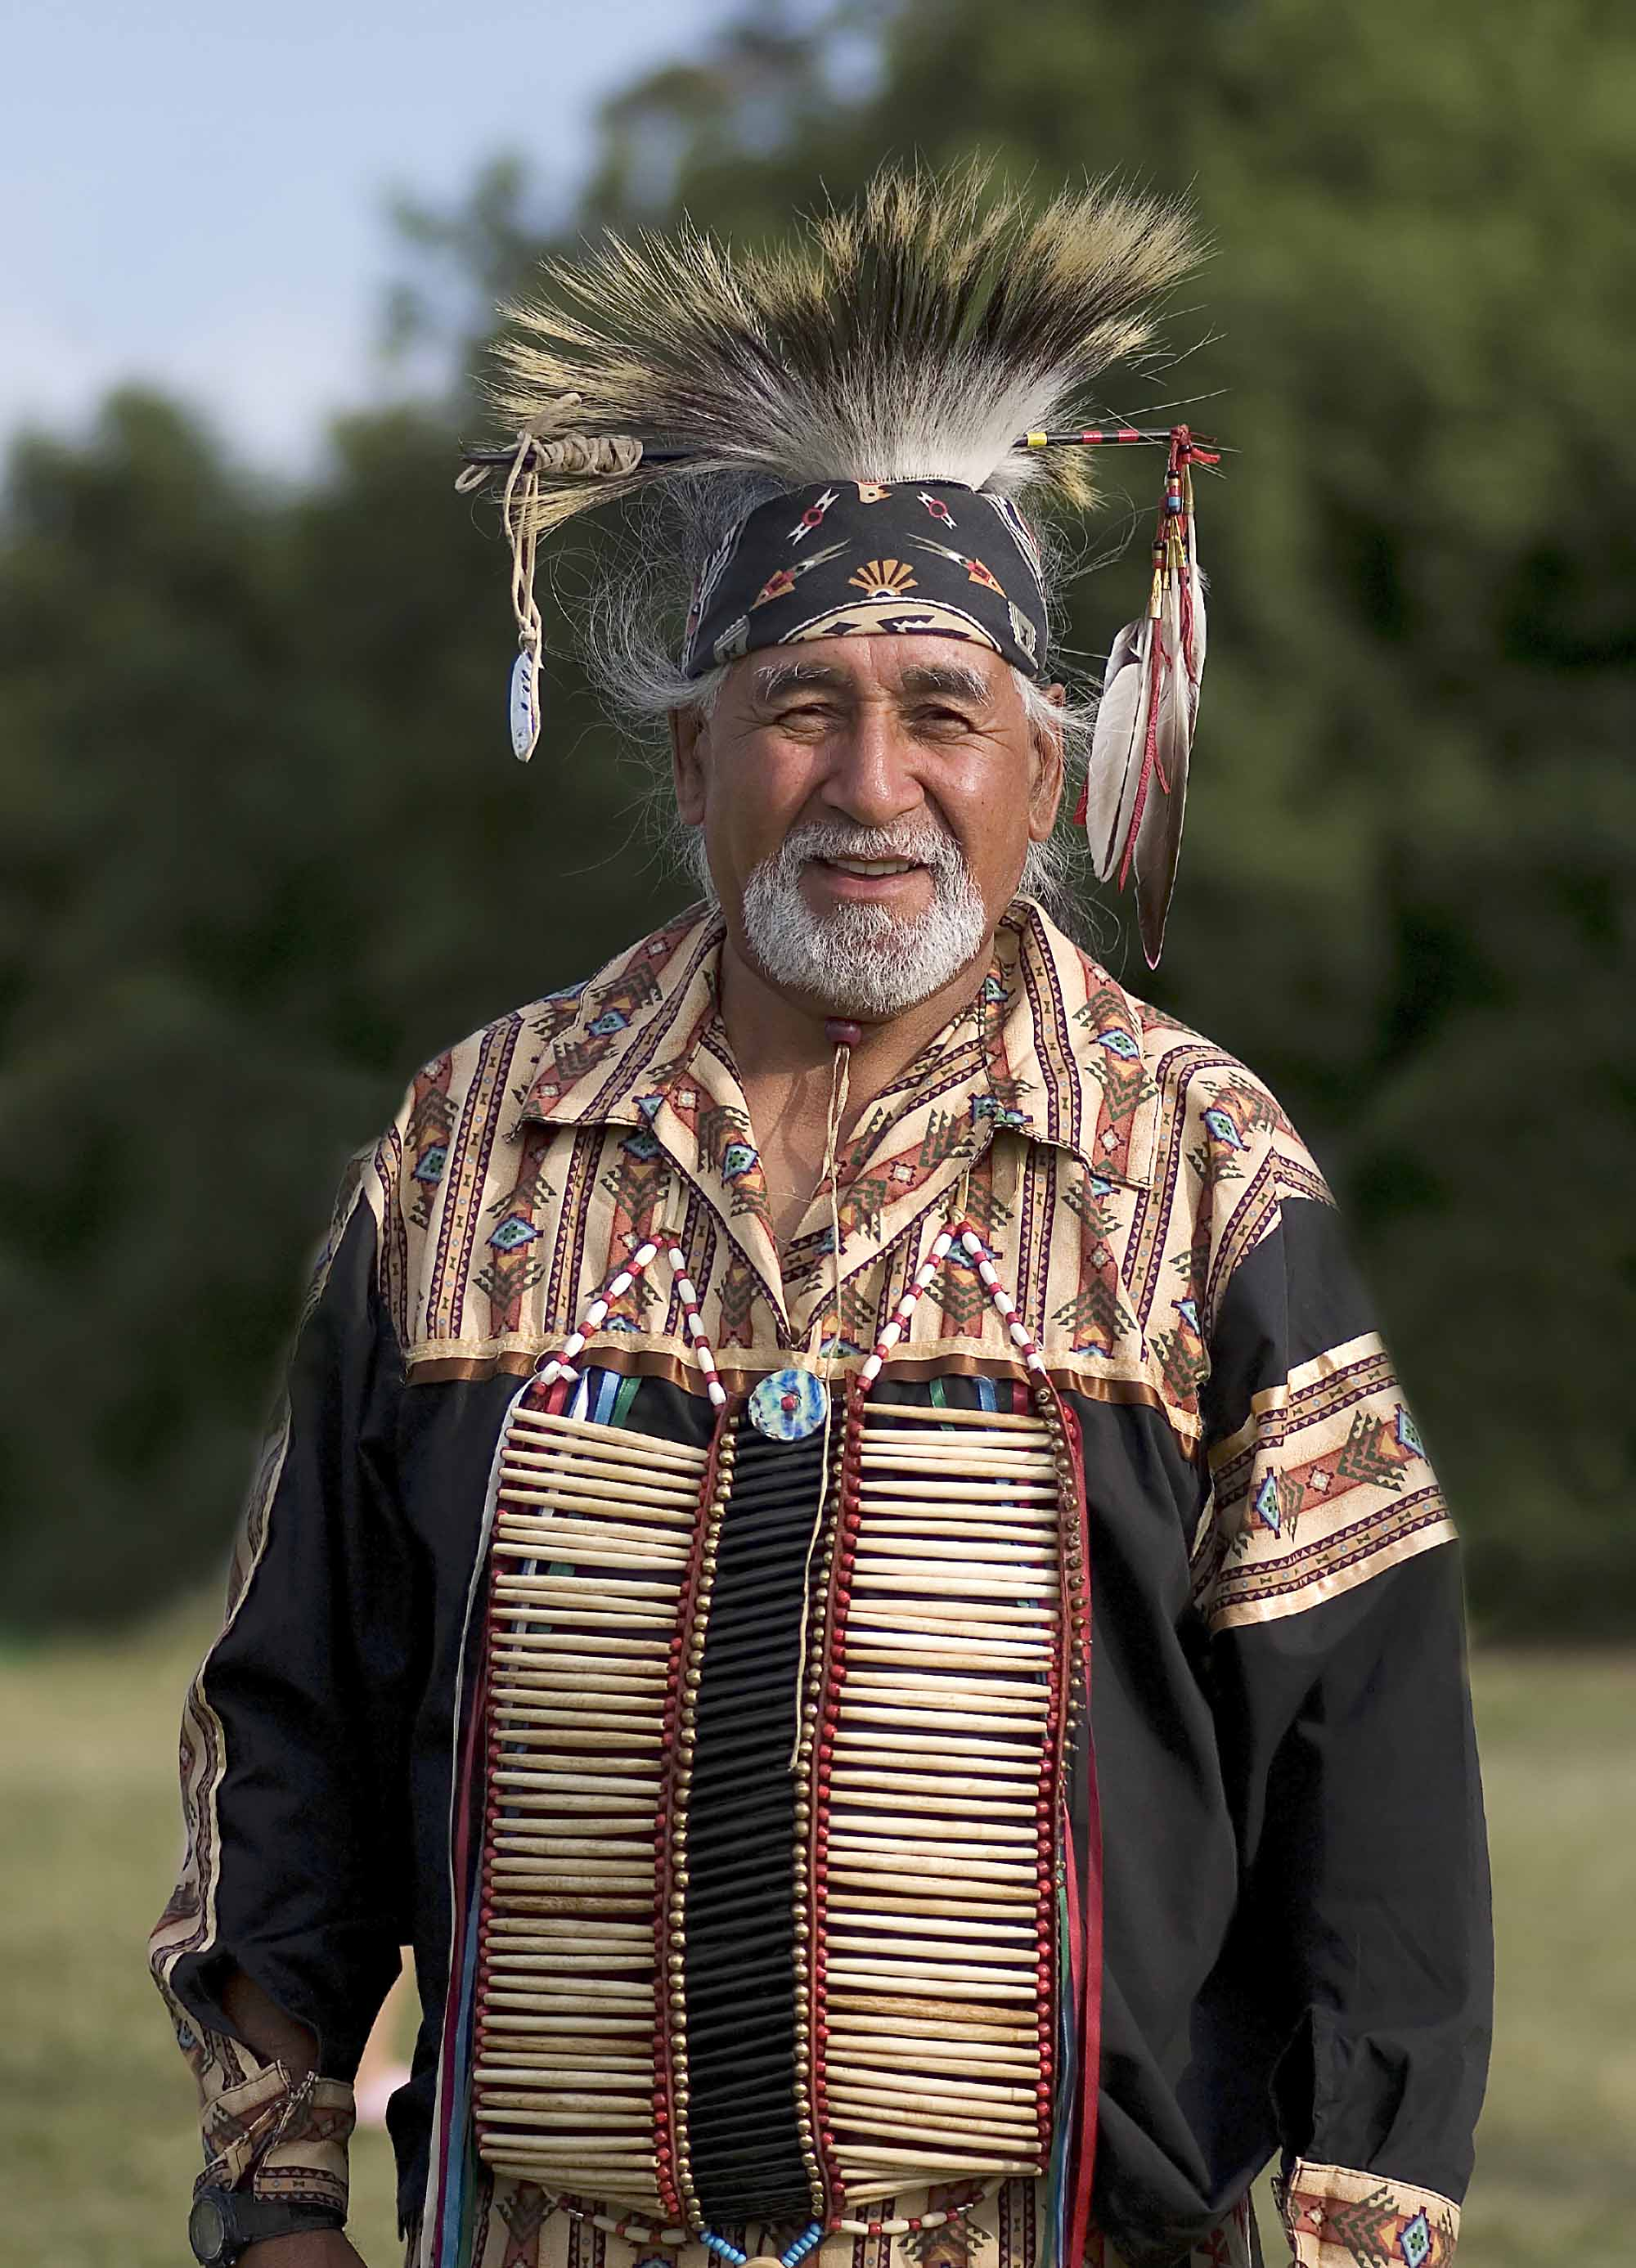 Powwow Elder